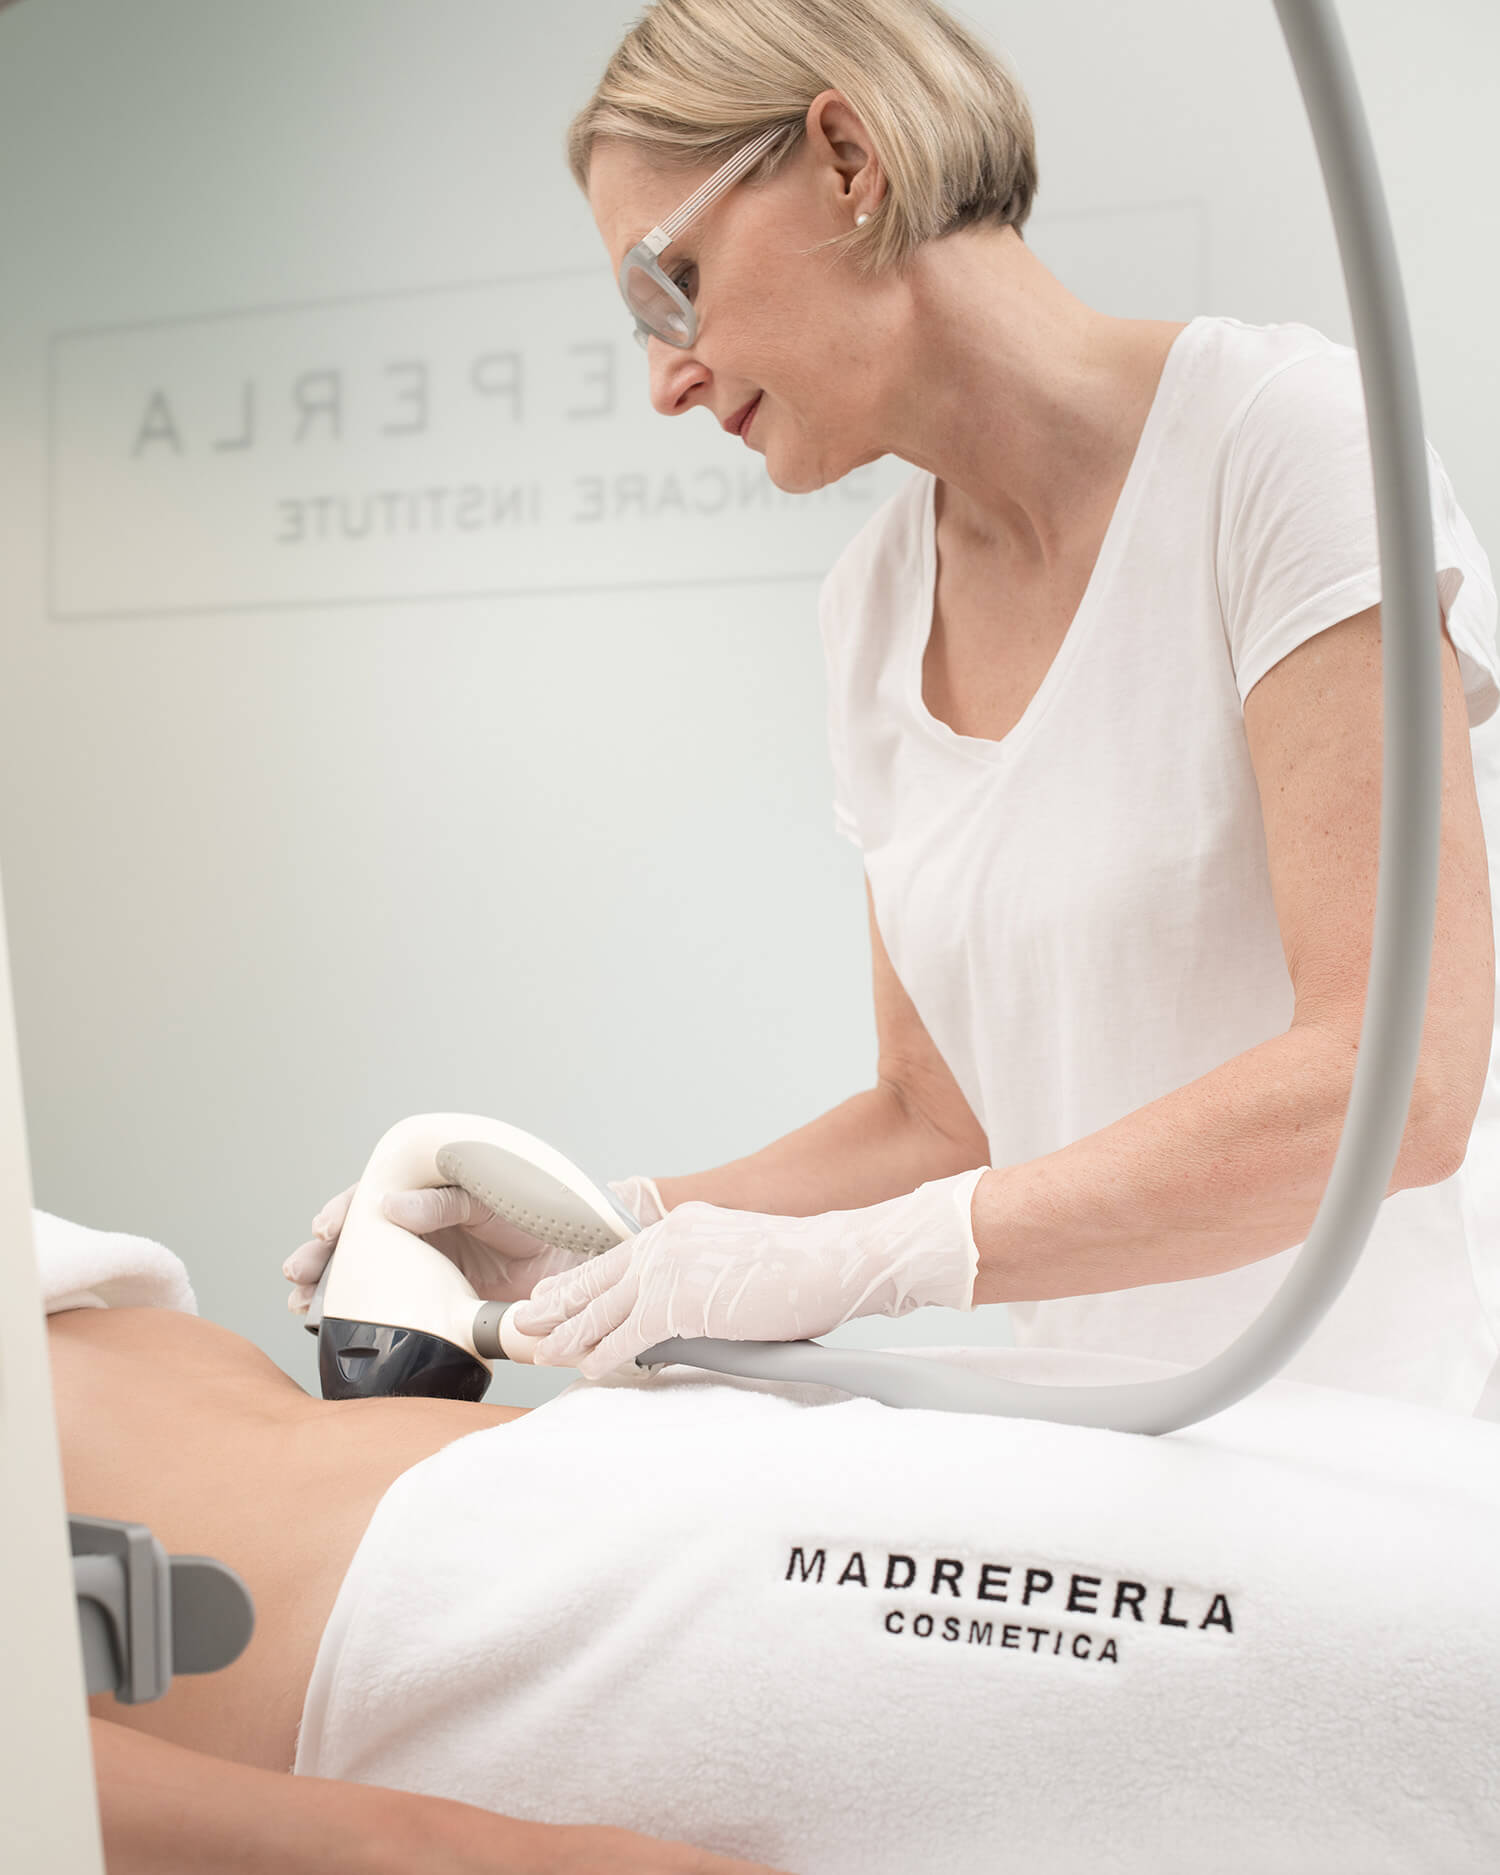 Behandlung-Madreperla